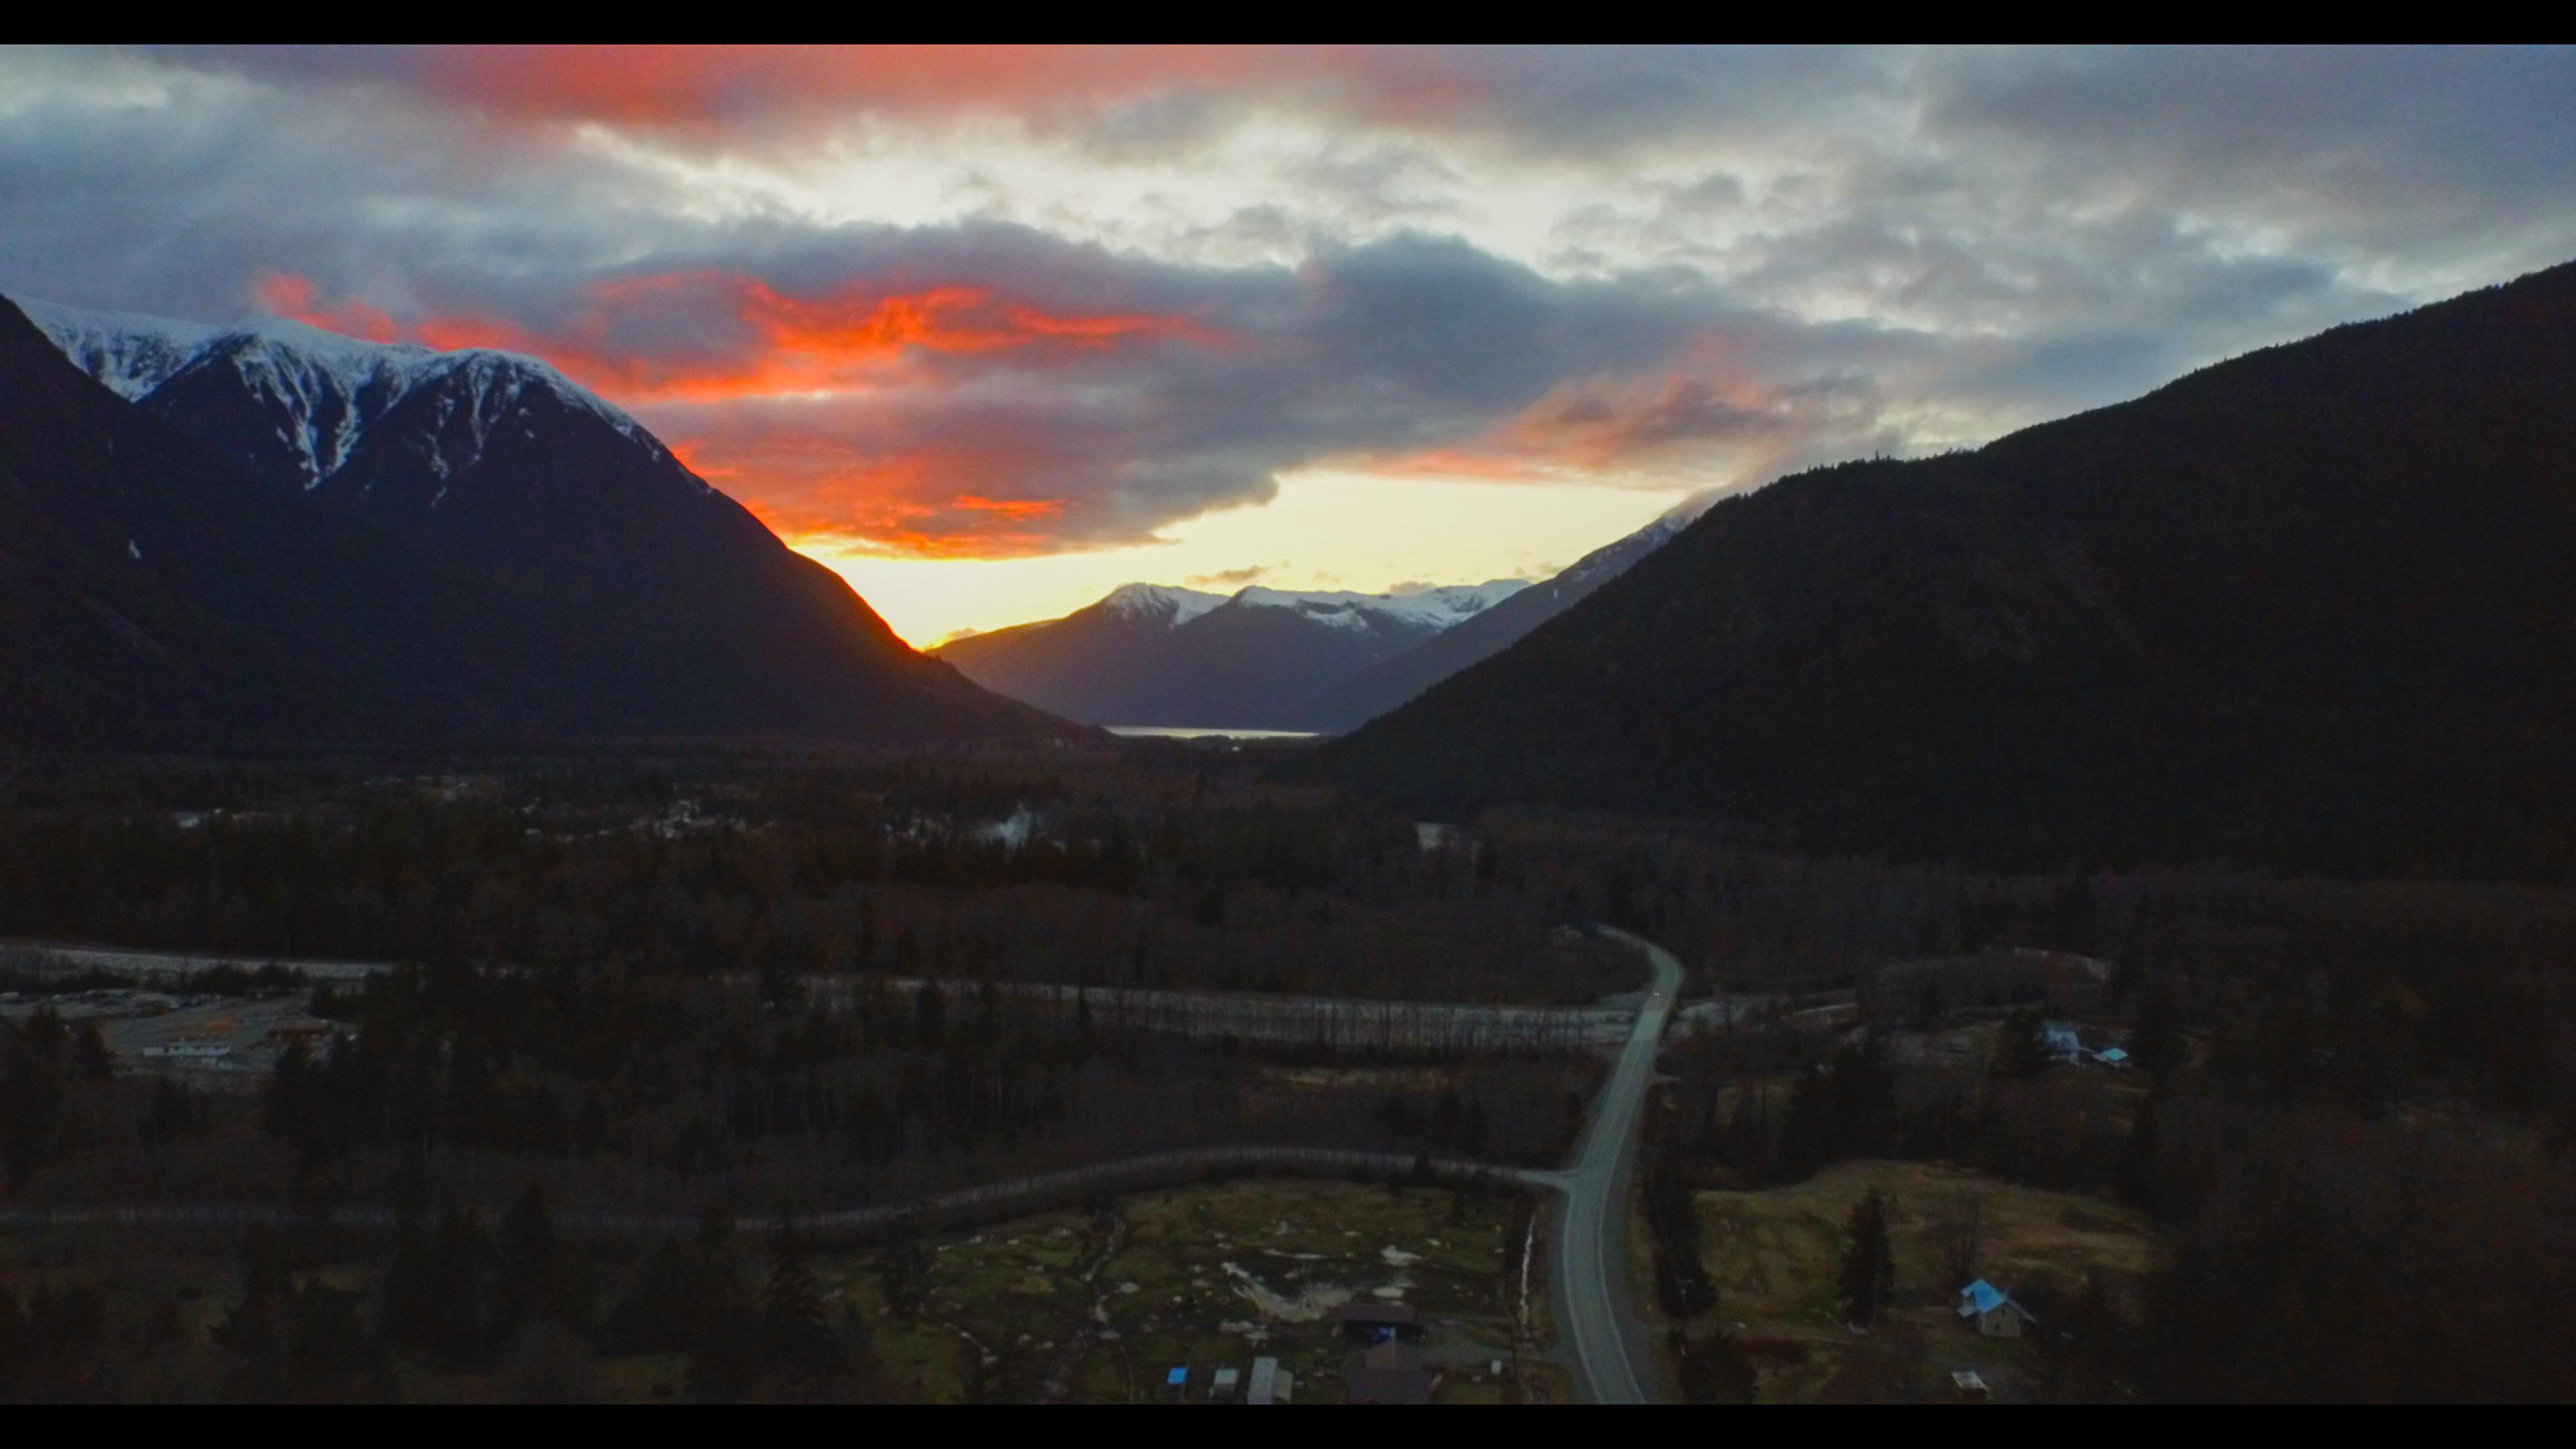 Sunset in British Columbia